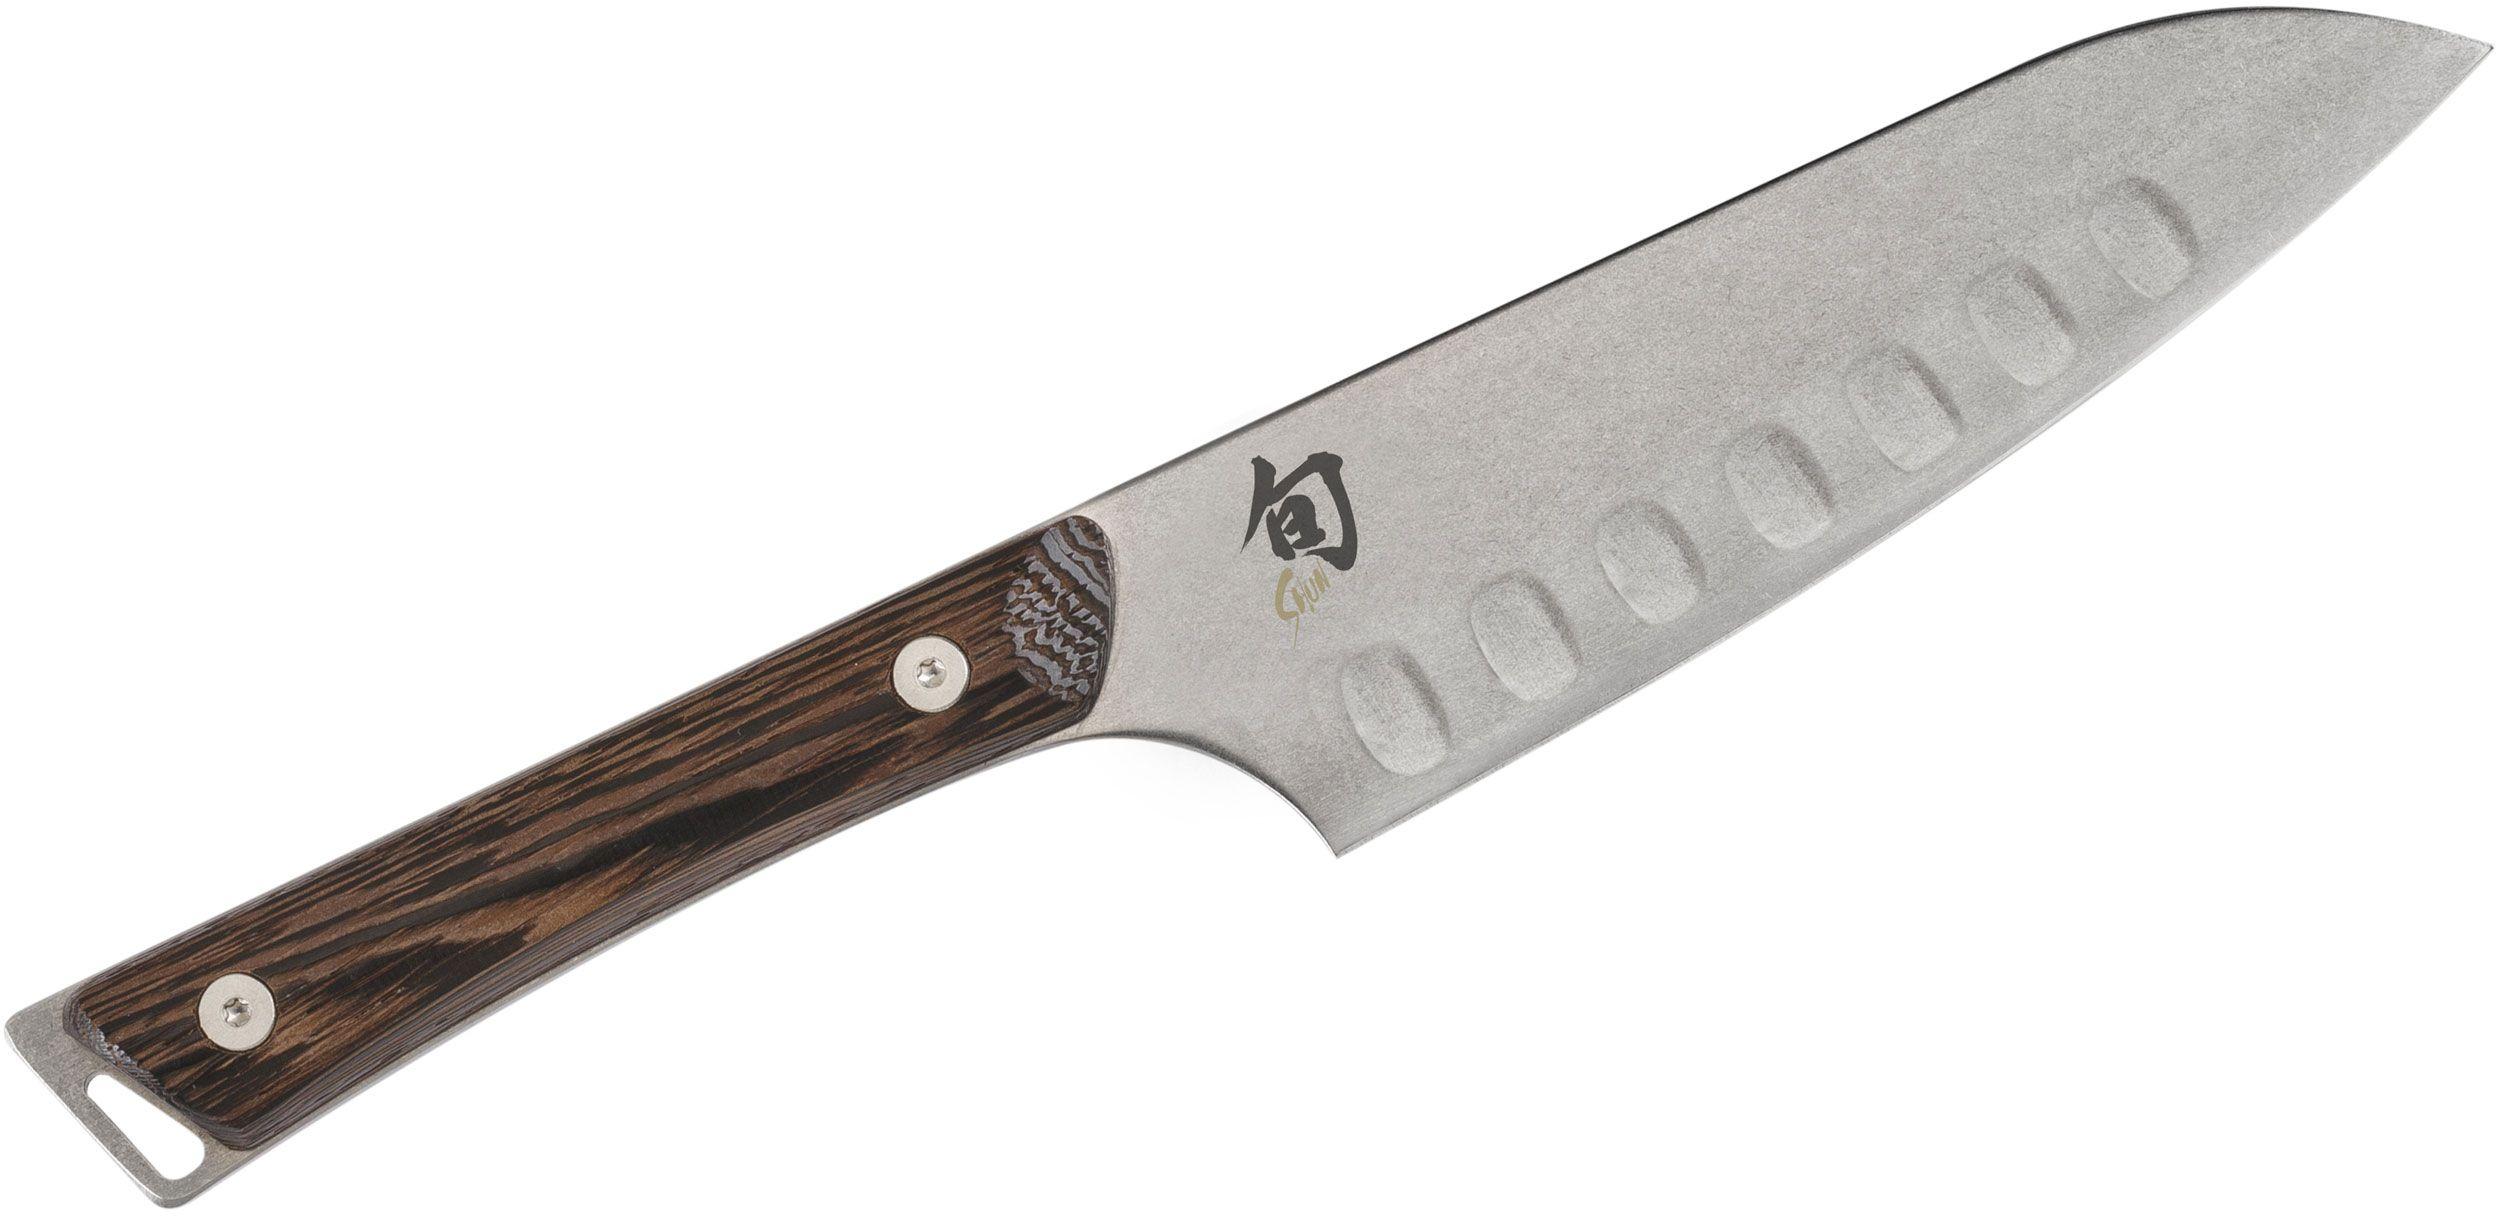 Shun SWT0727 Kanso Hollow Ground Santoku Knife 5.5 inch Blade, Tagayasan Wood Handles